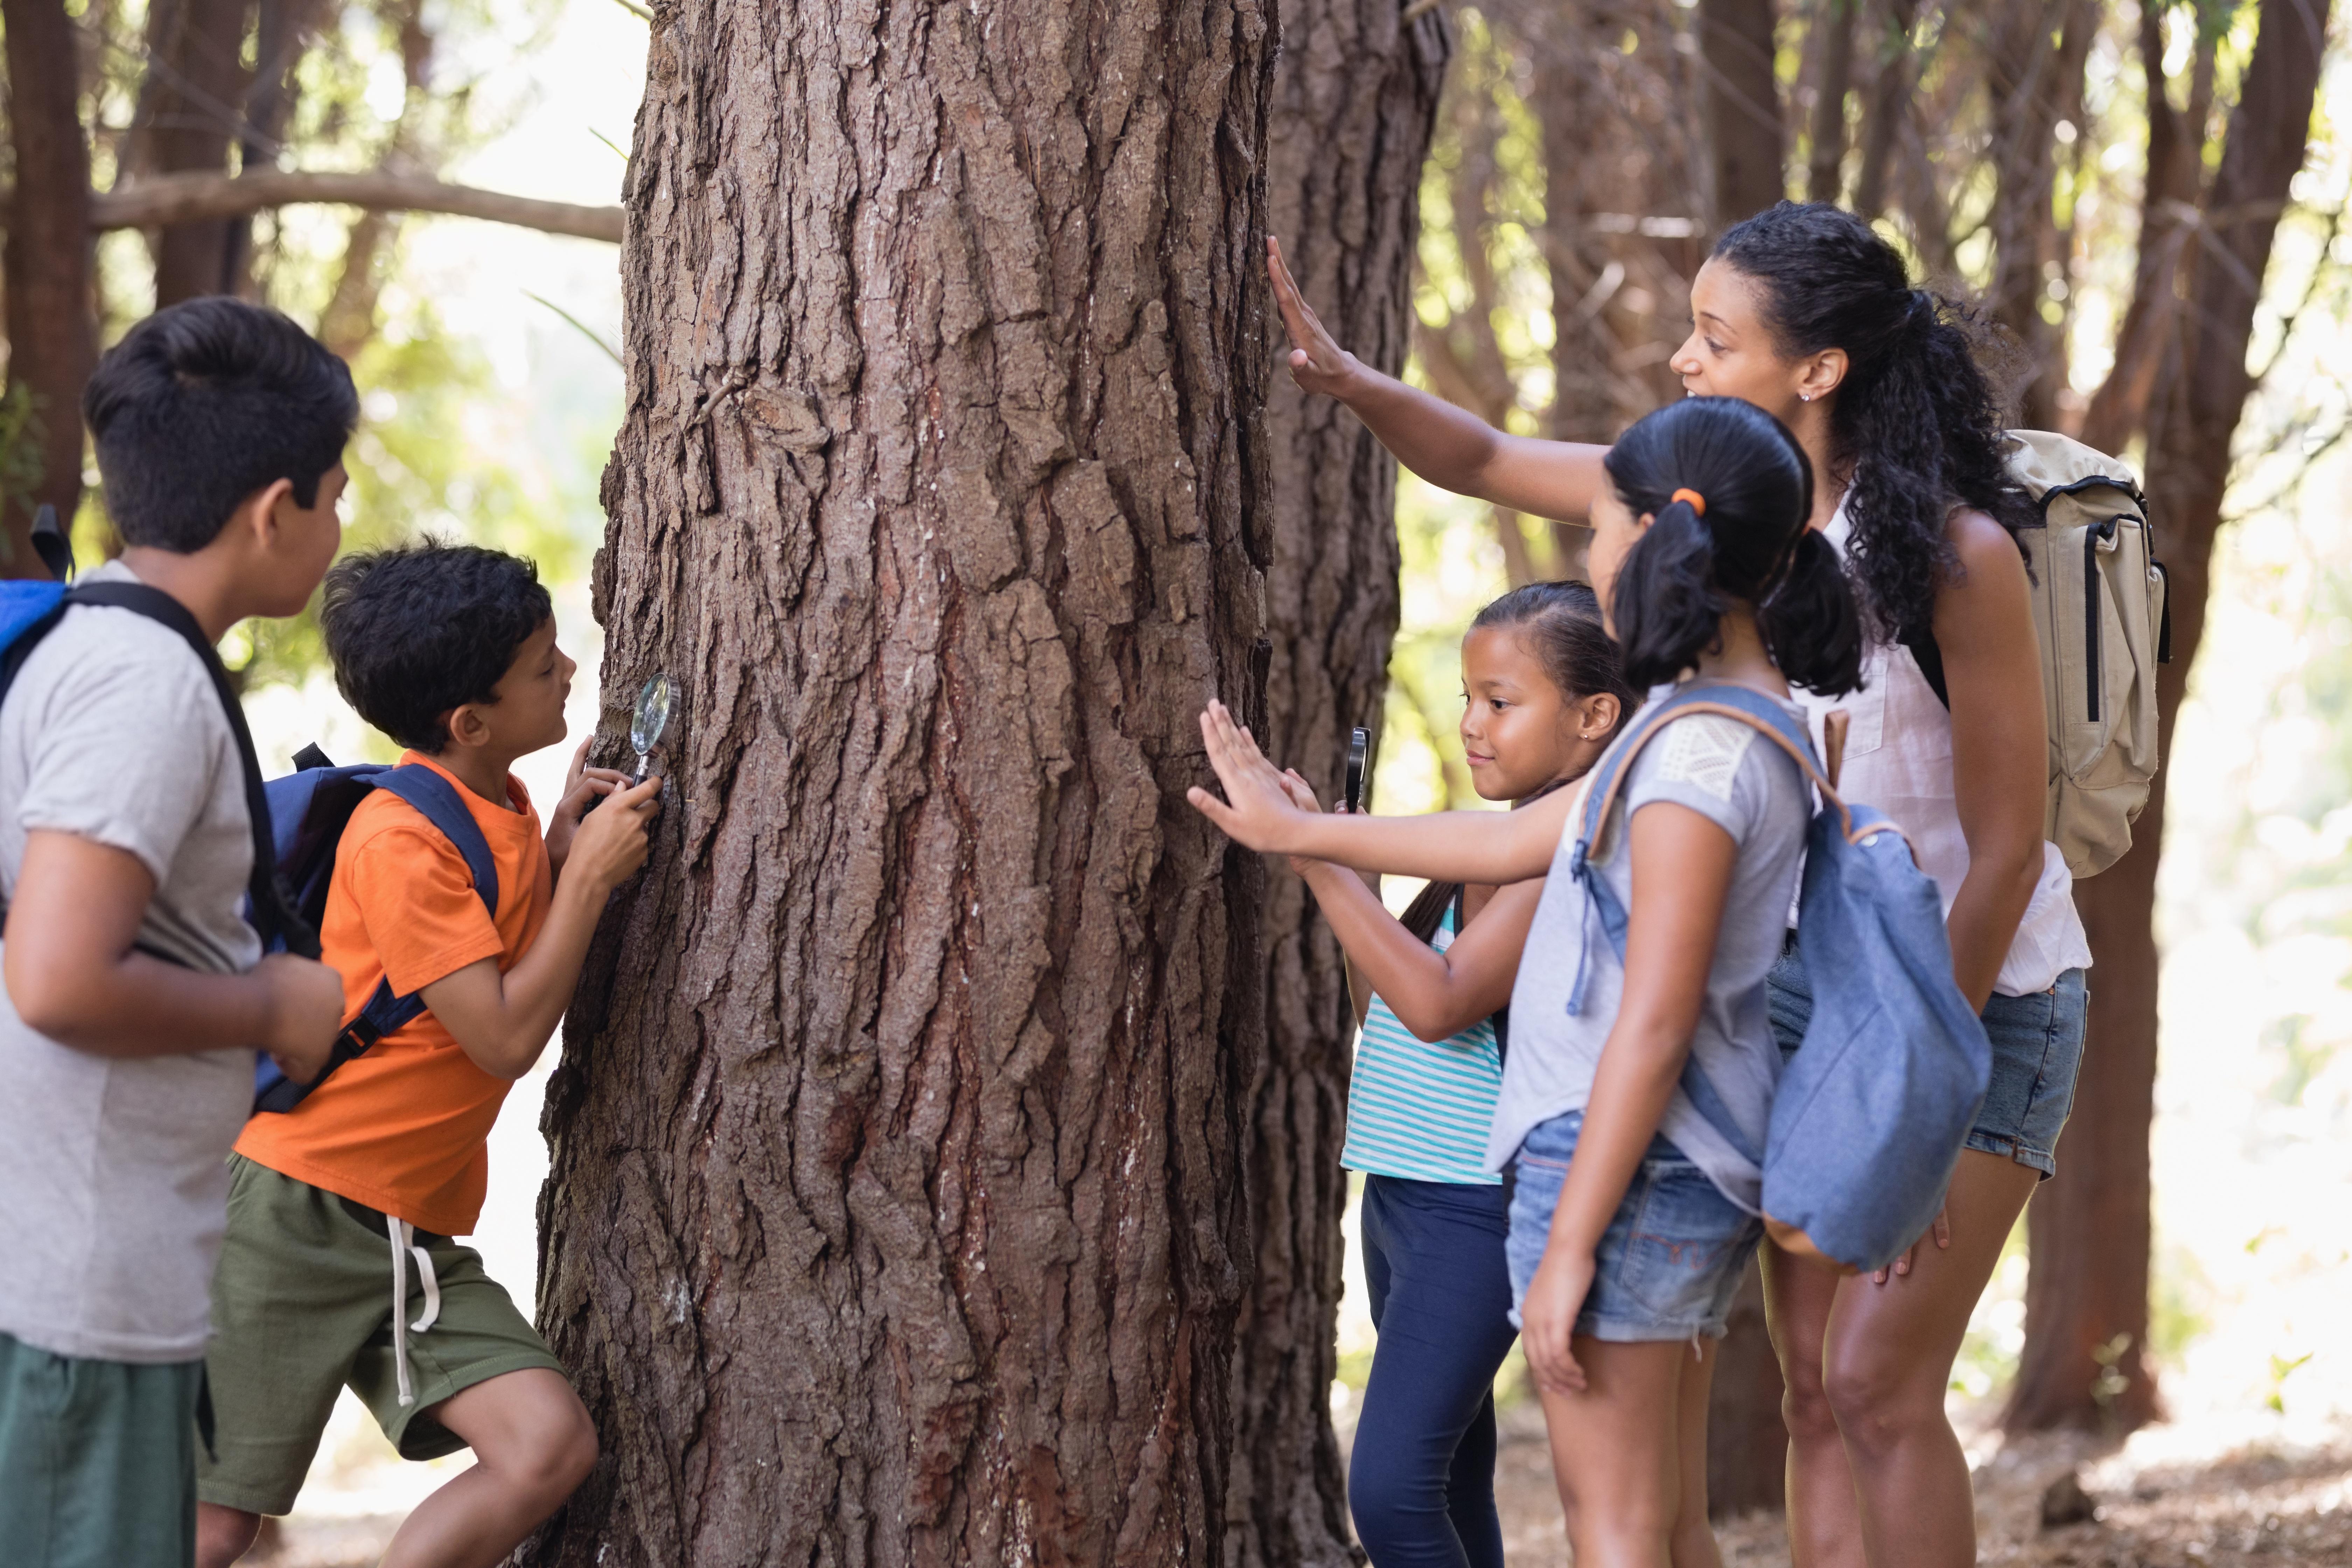 Kids looking at tree